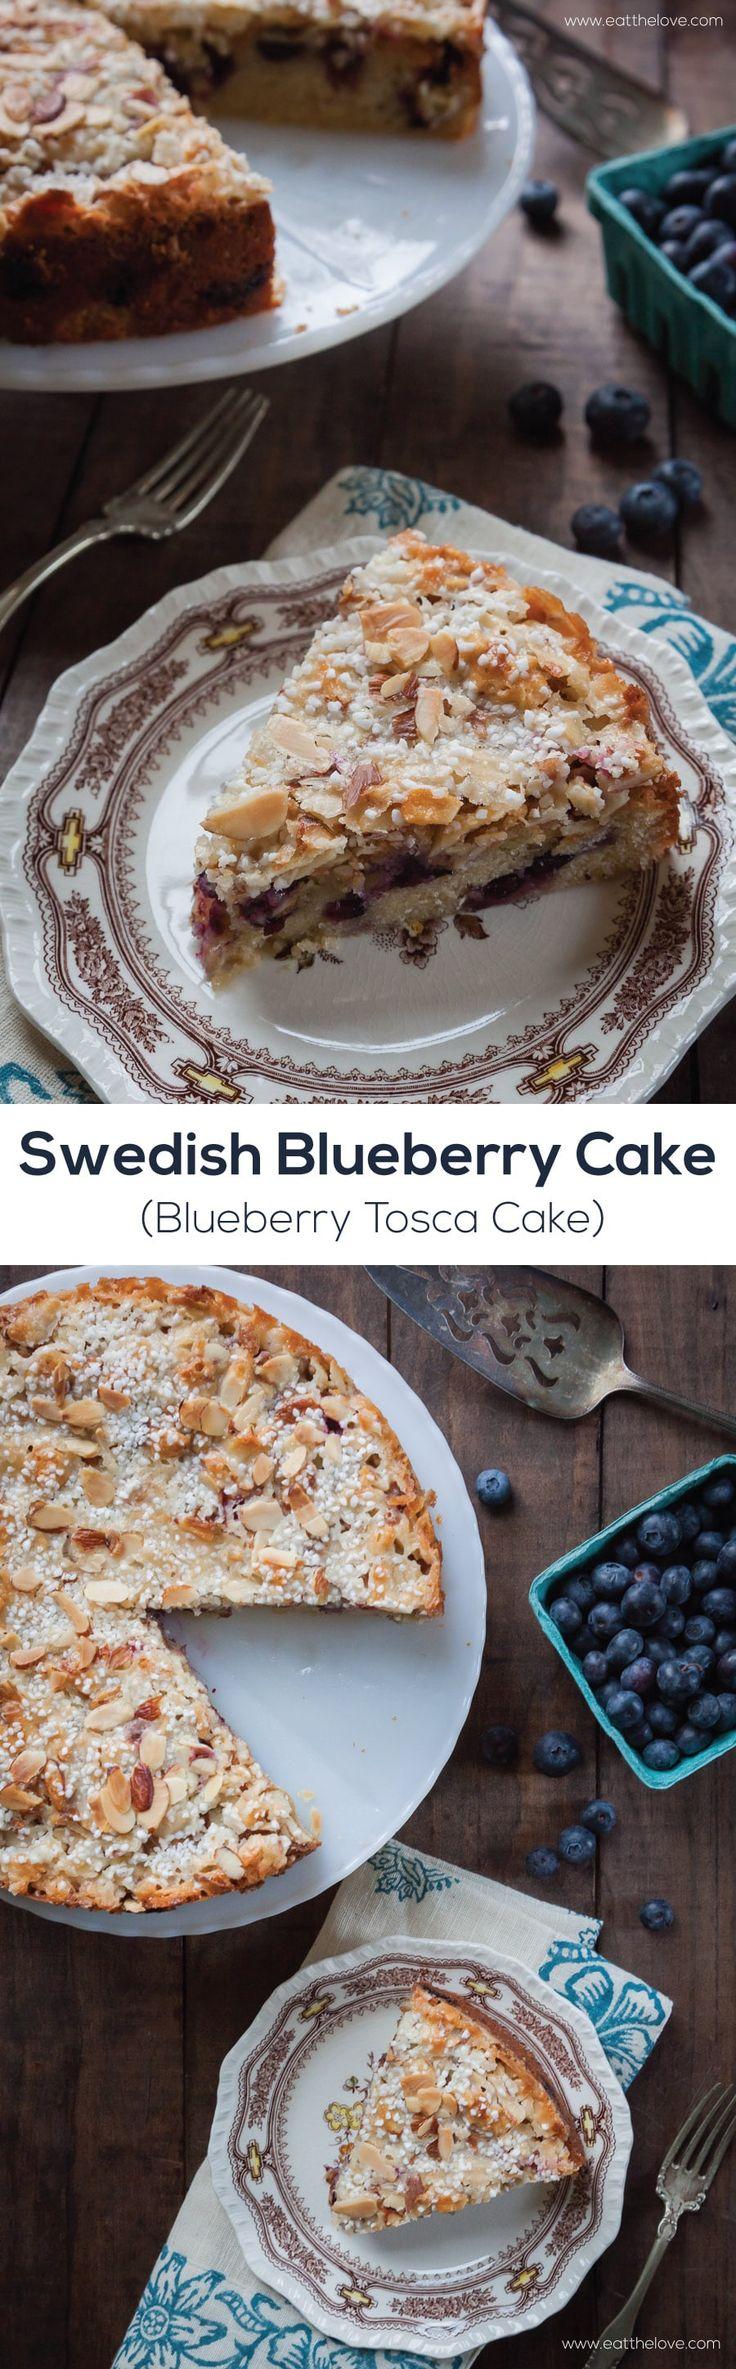 Swedish Blueberry Cake (Toscakaka aka, Blueberry Toska Cake). Photo and recipe by Irvin Lin